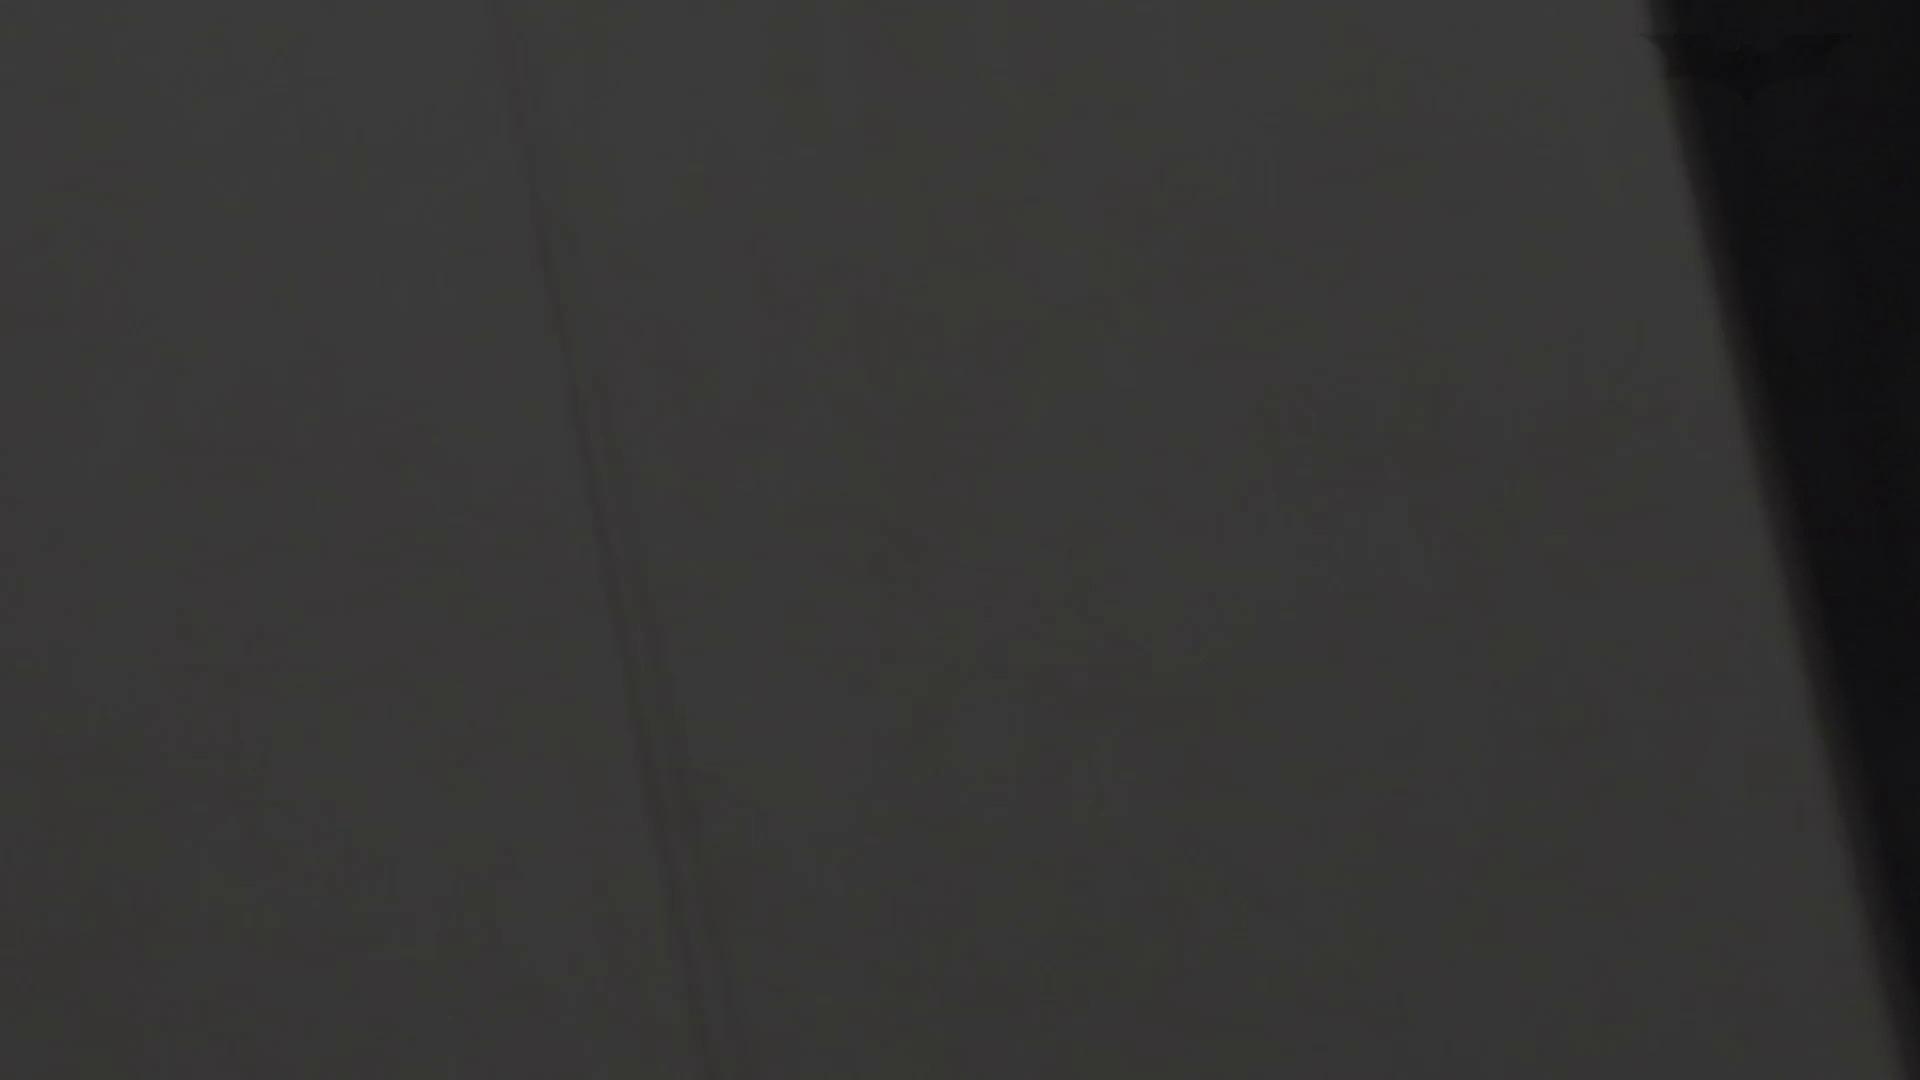 JD盗撮 美女の洗面所の秘密 Vol.73 盗撮映像大放出 おめこ無修正画像 67連発 18